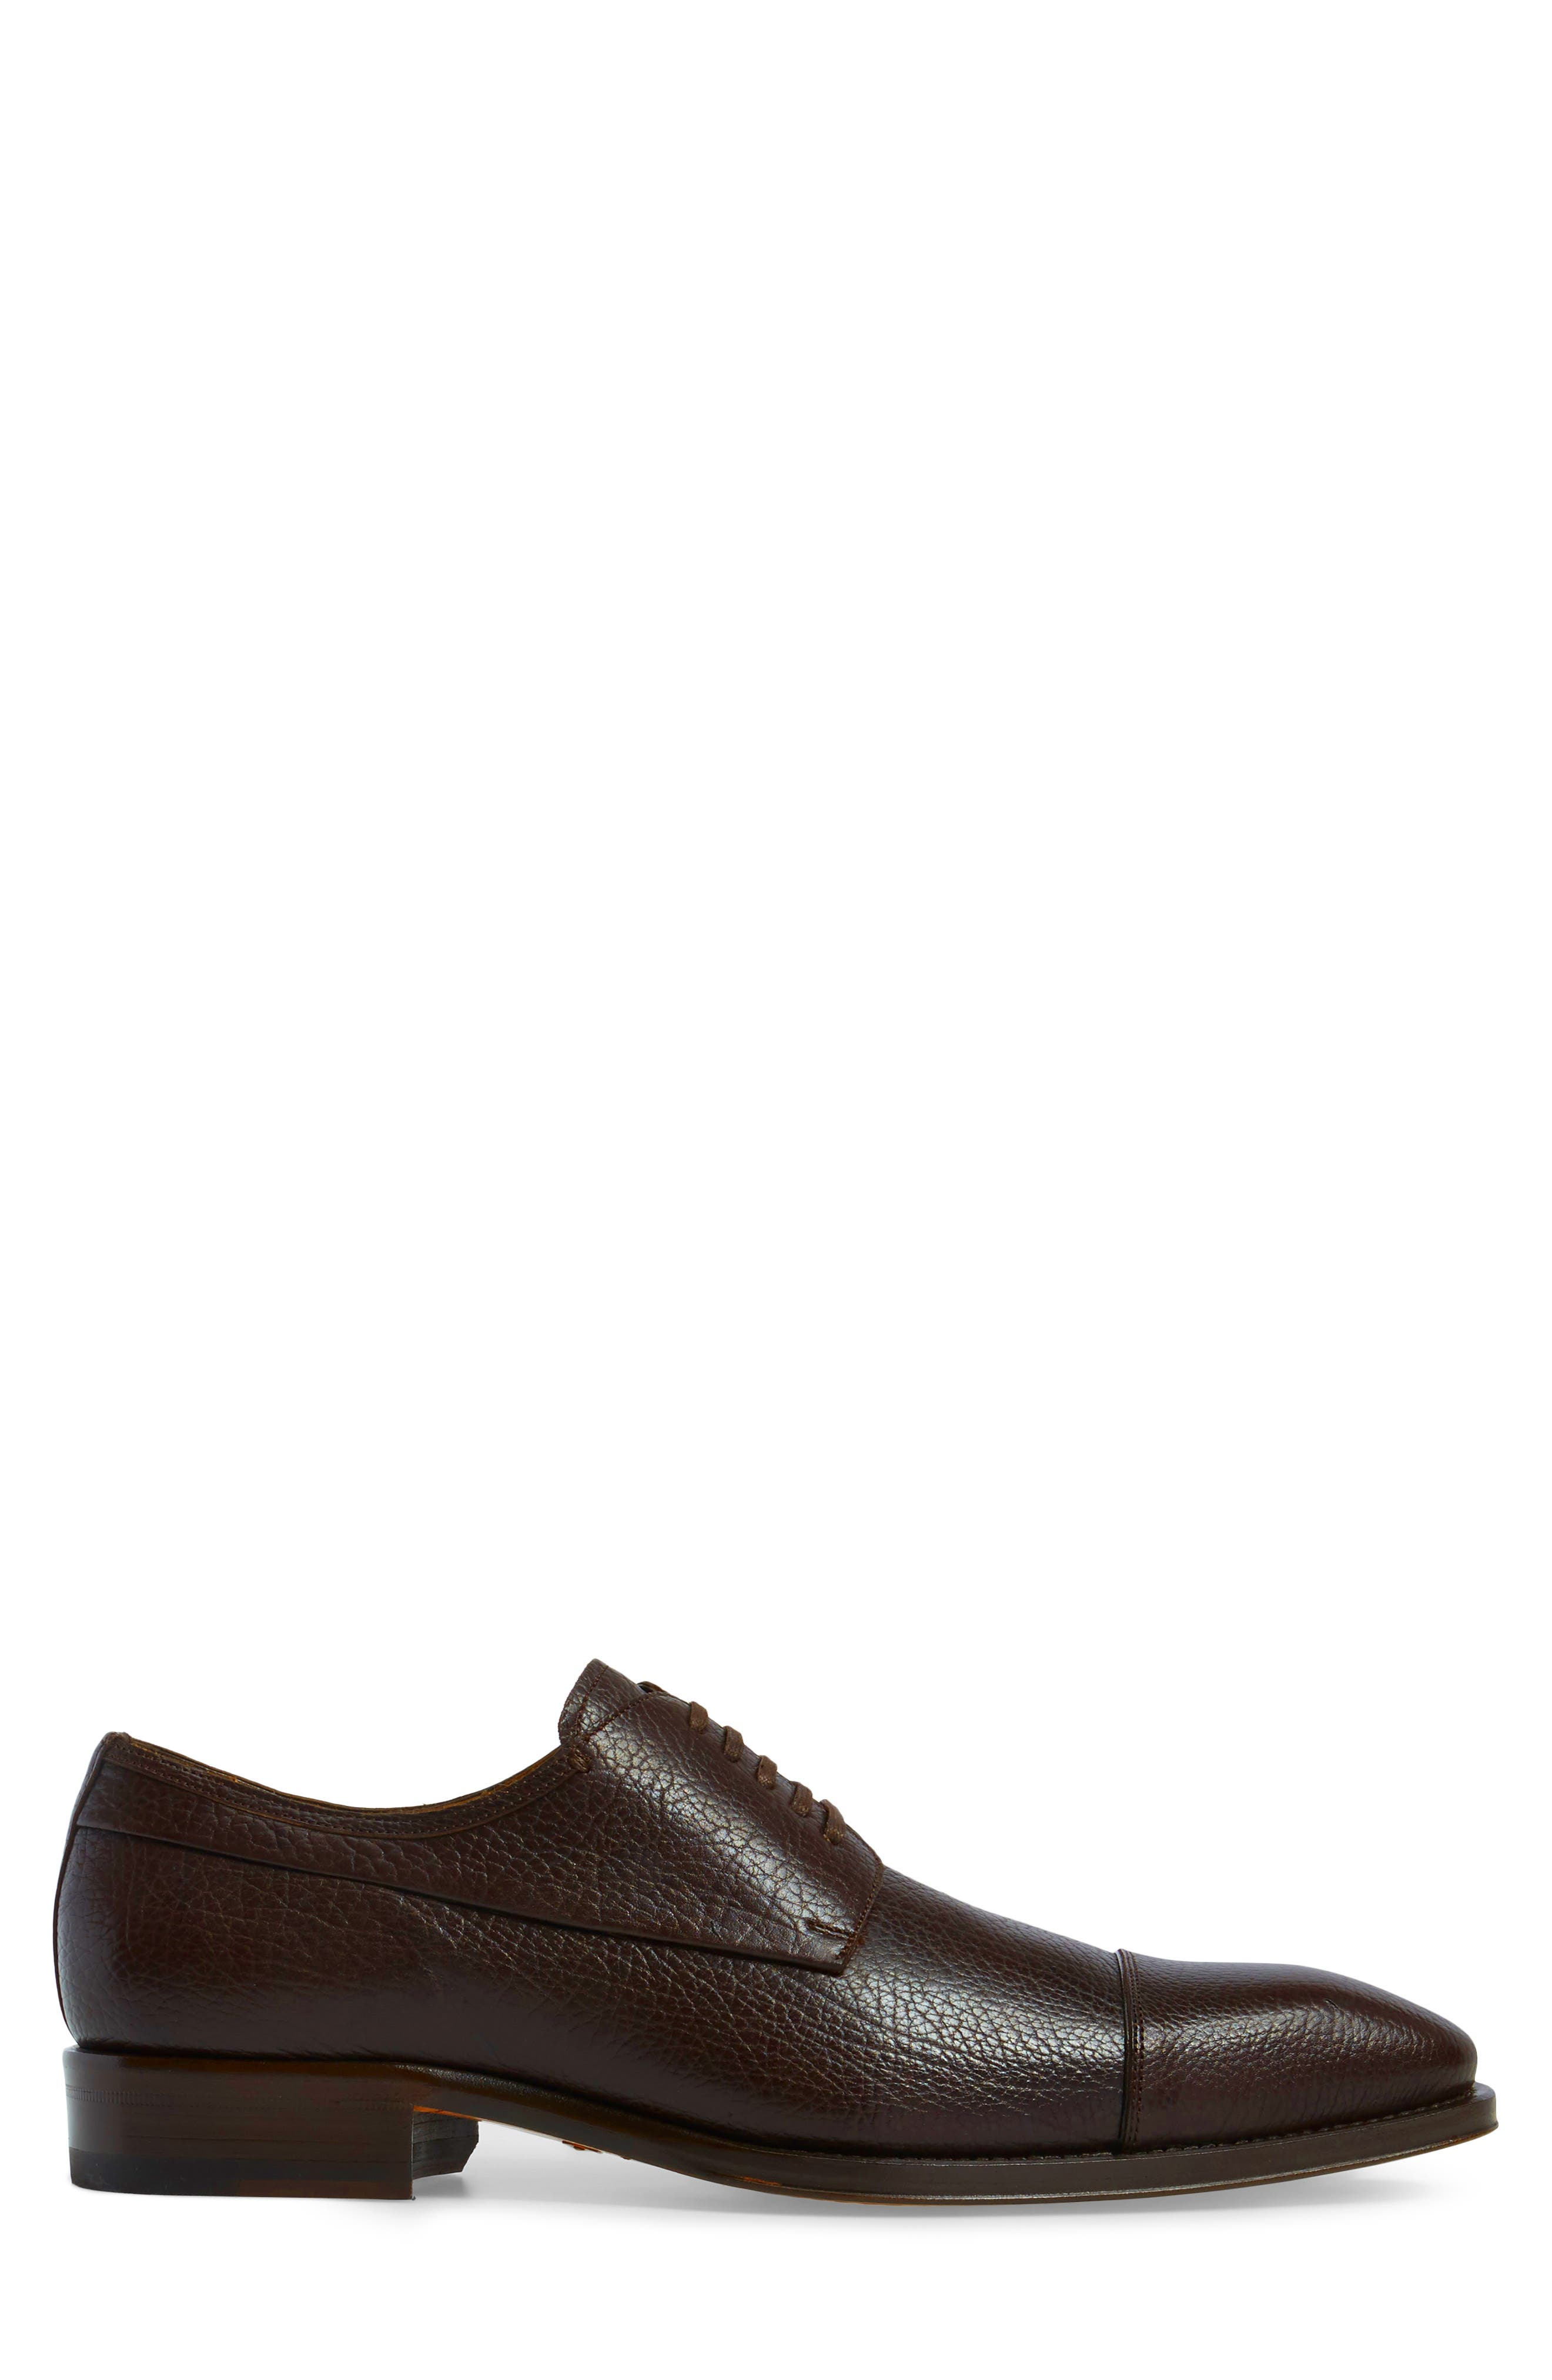 Pulpi Cap Toe Derby,                             Alternate thumbnail 3, color,                             Brown Leather